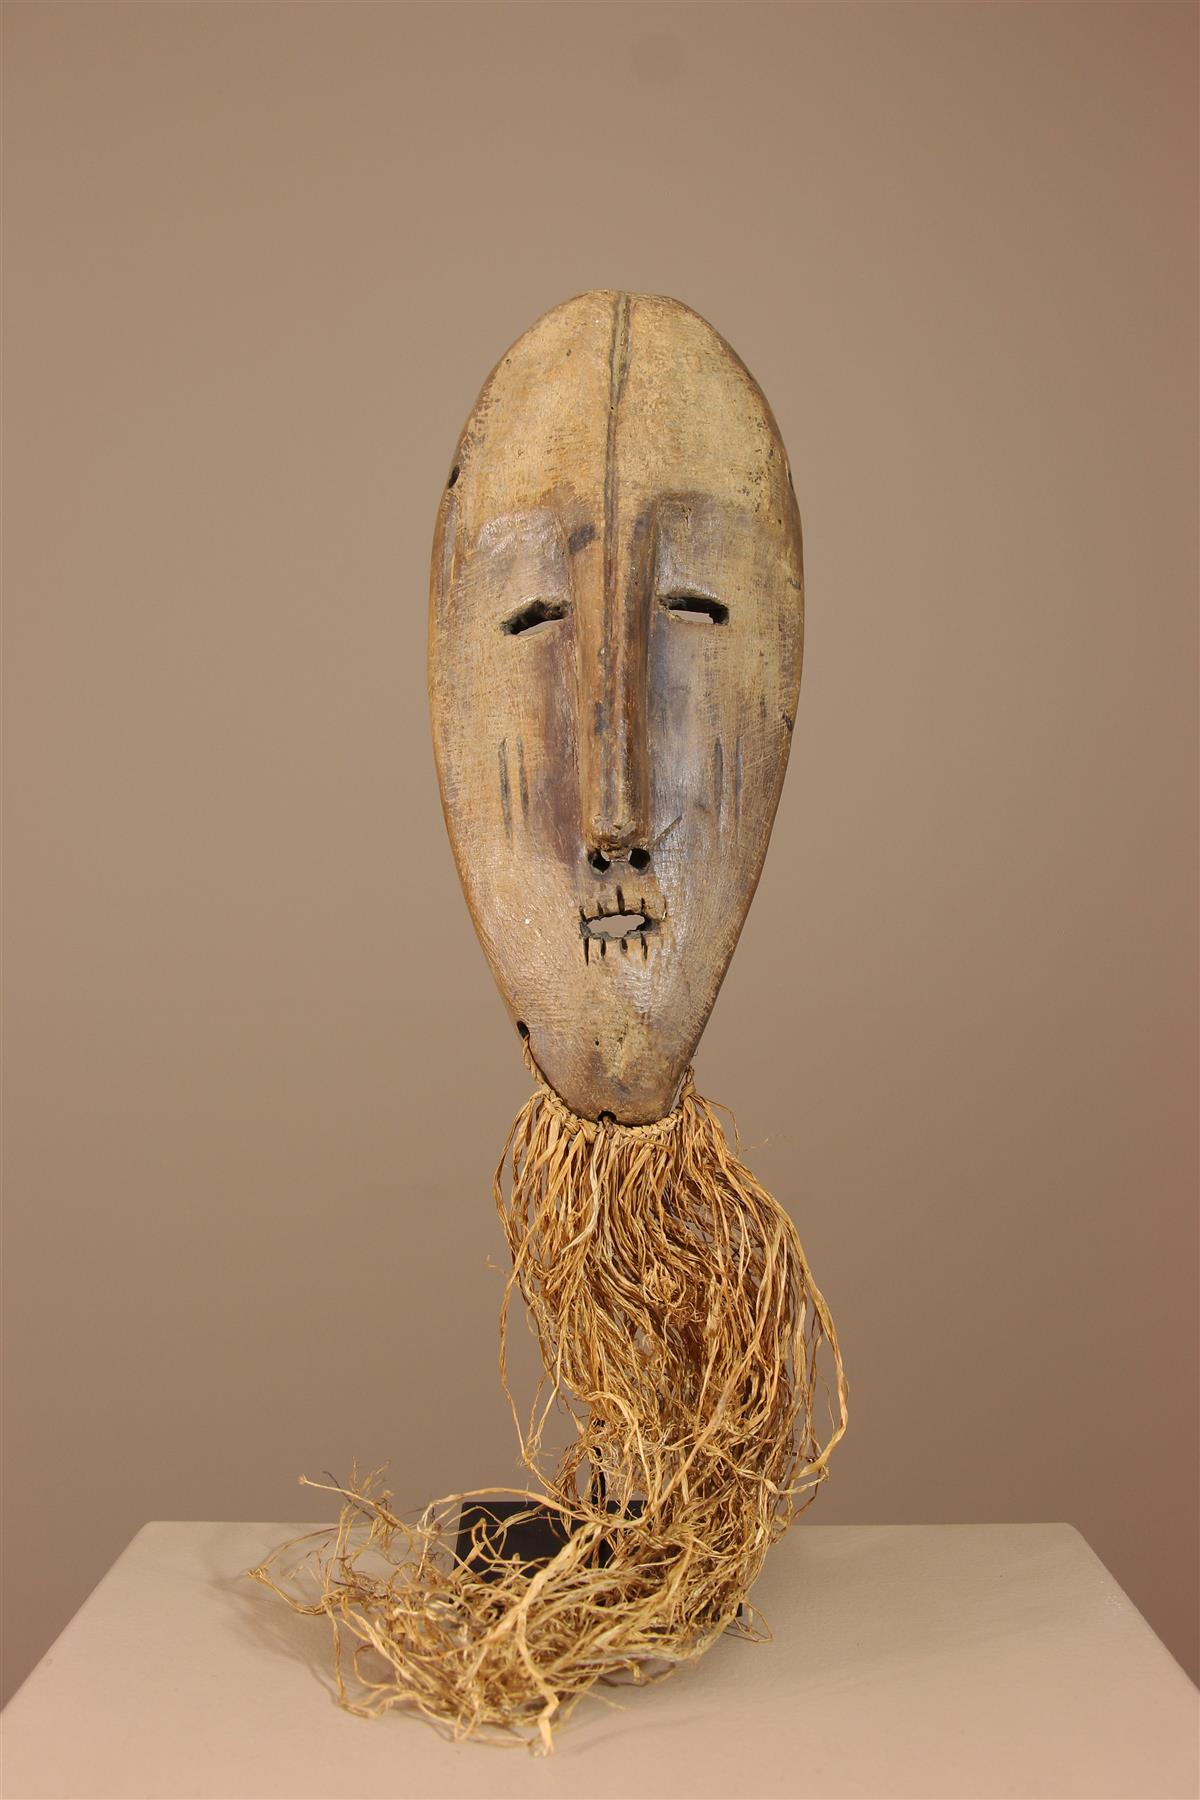 Masque Lega - Déco africaine - Art africain traditionnel